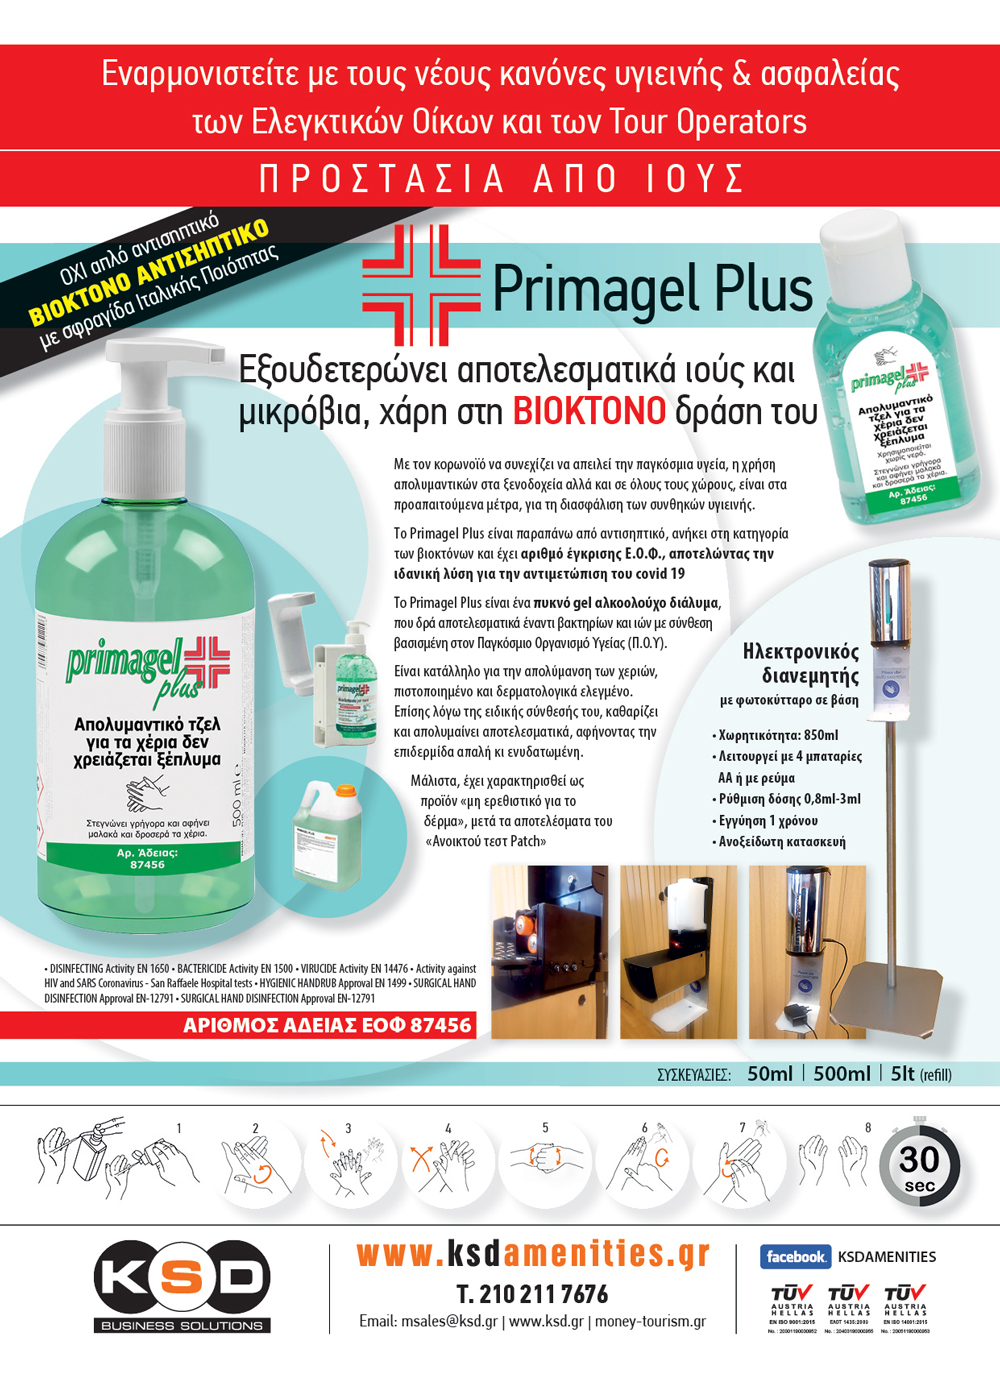 ksd PRIMAGEL ΕΟΤ